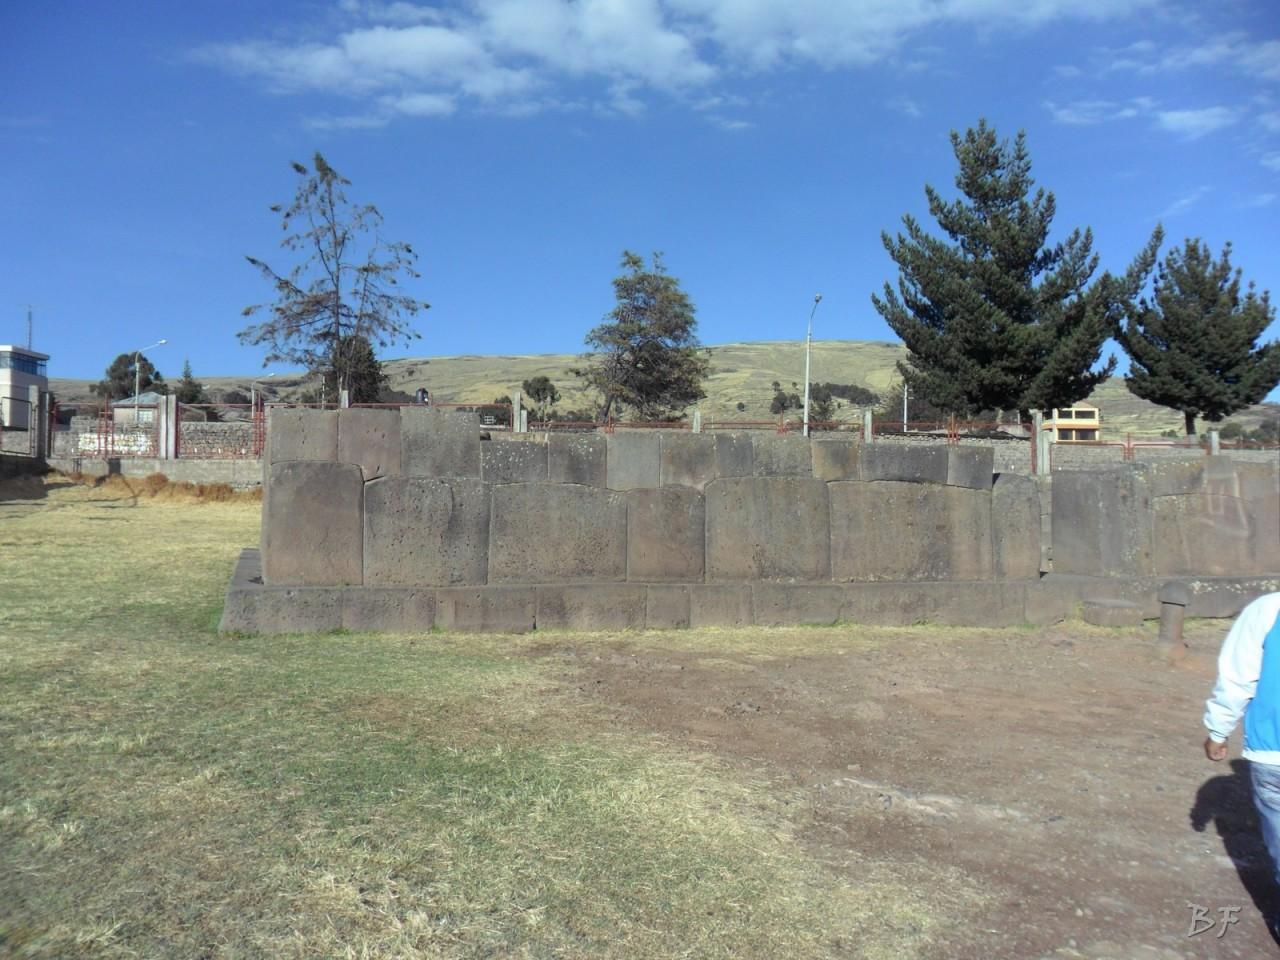 Mura-Poligonali-Megaliti-Inca-Uyo-Puno-Perù-15